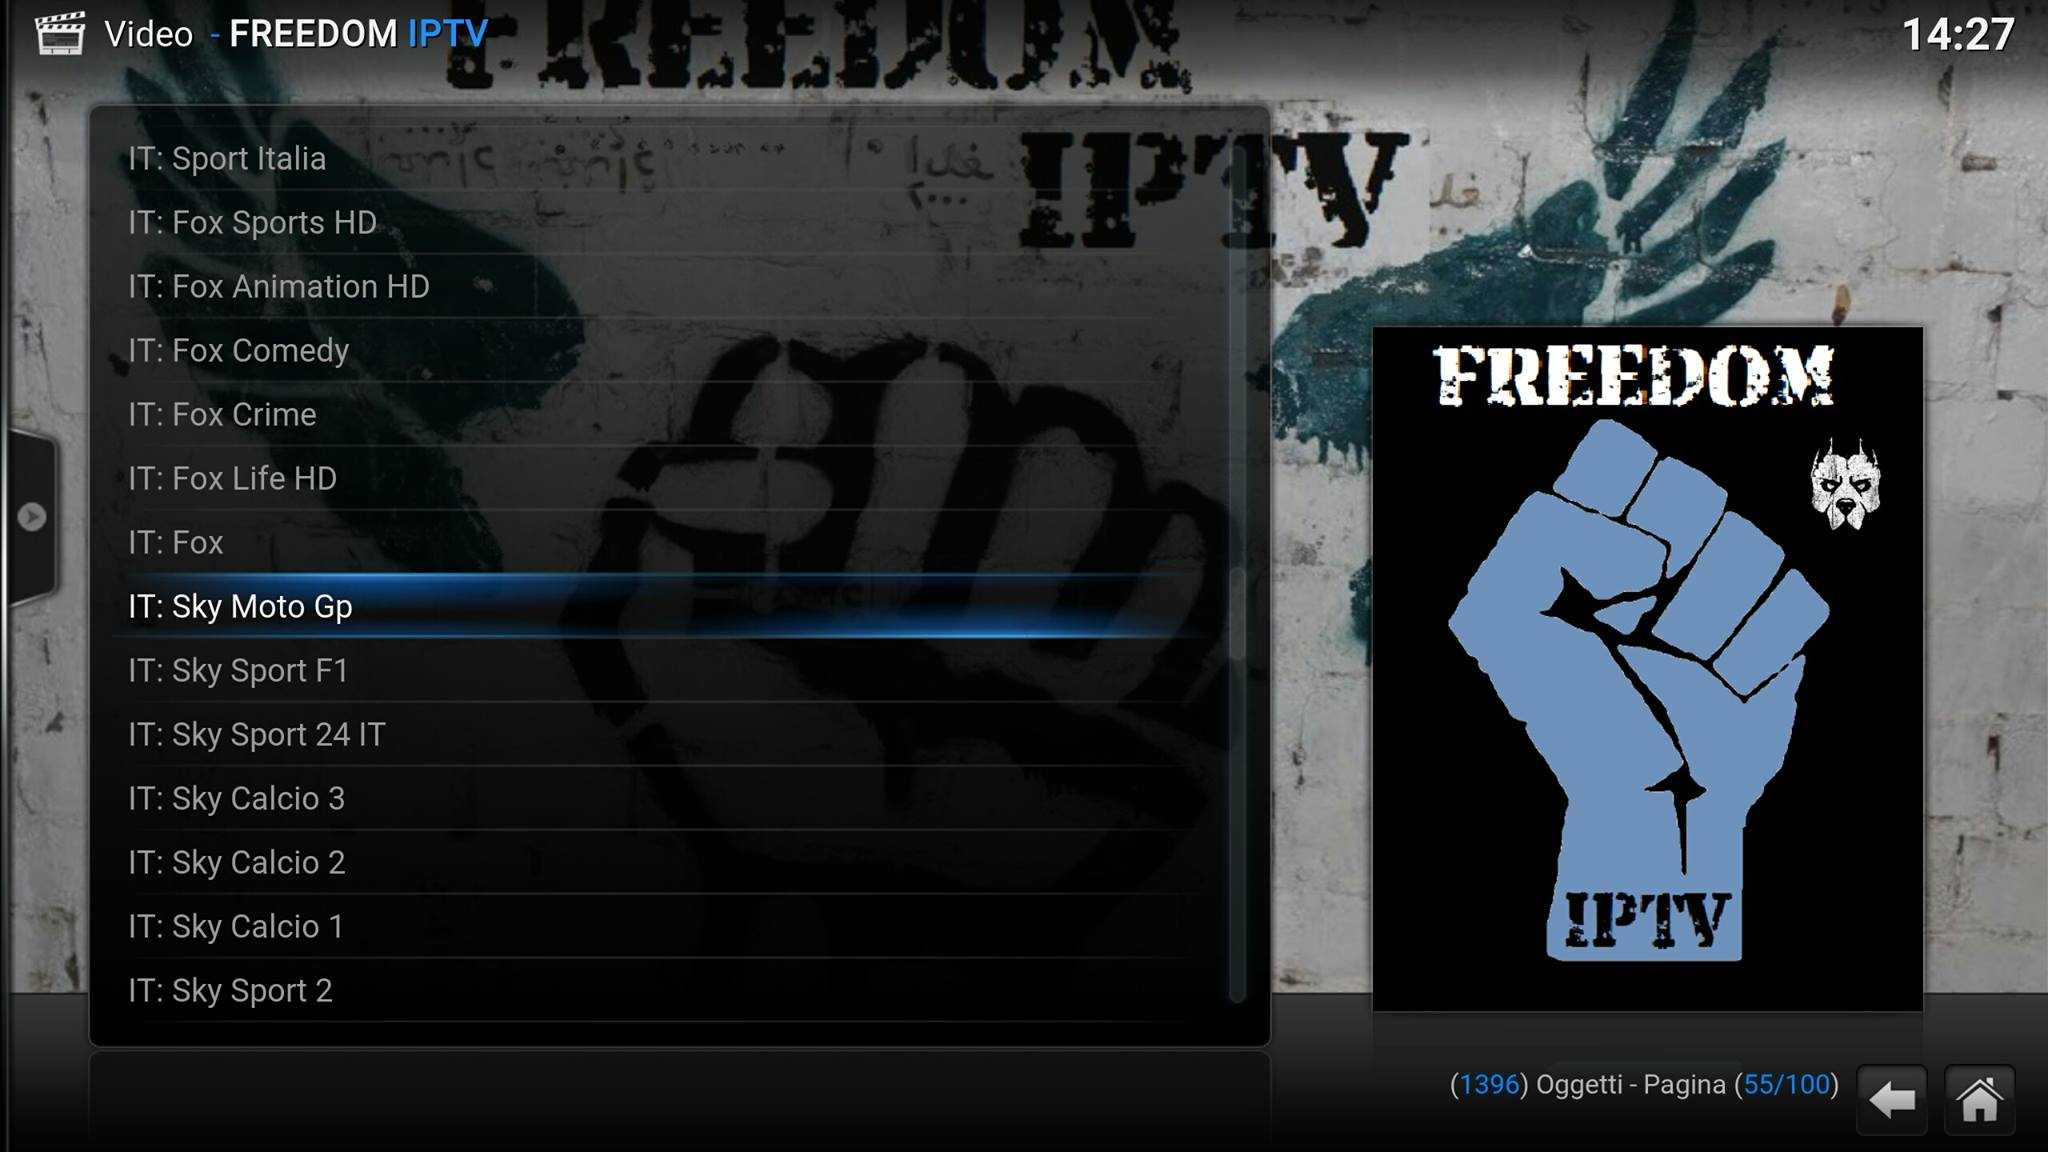 Freedom IPTV